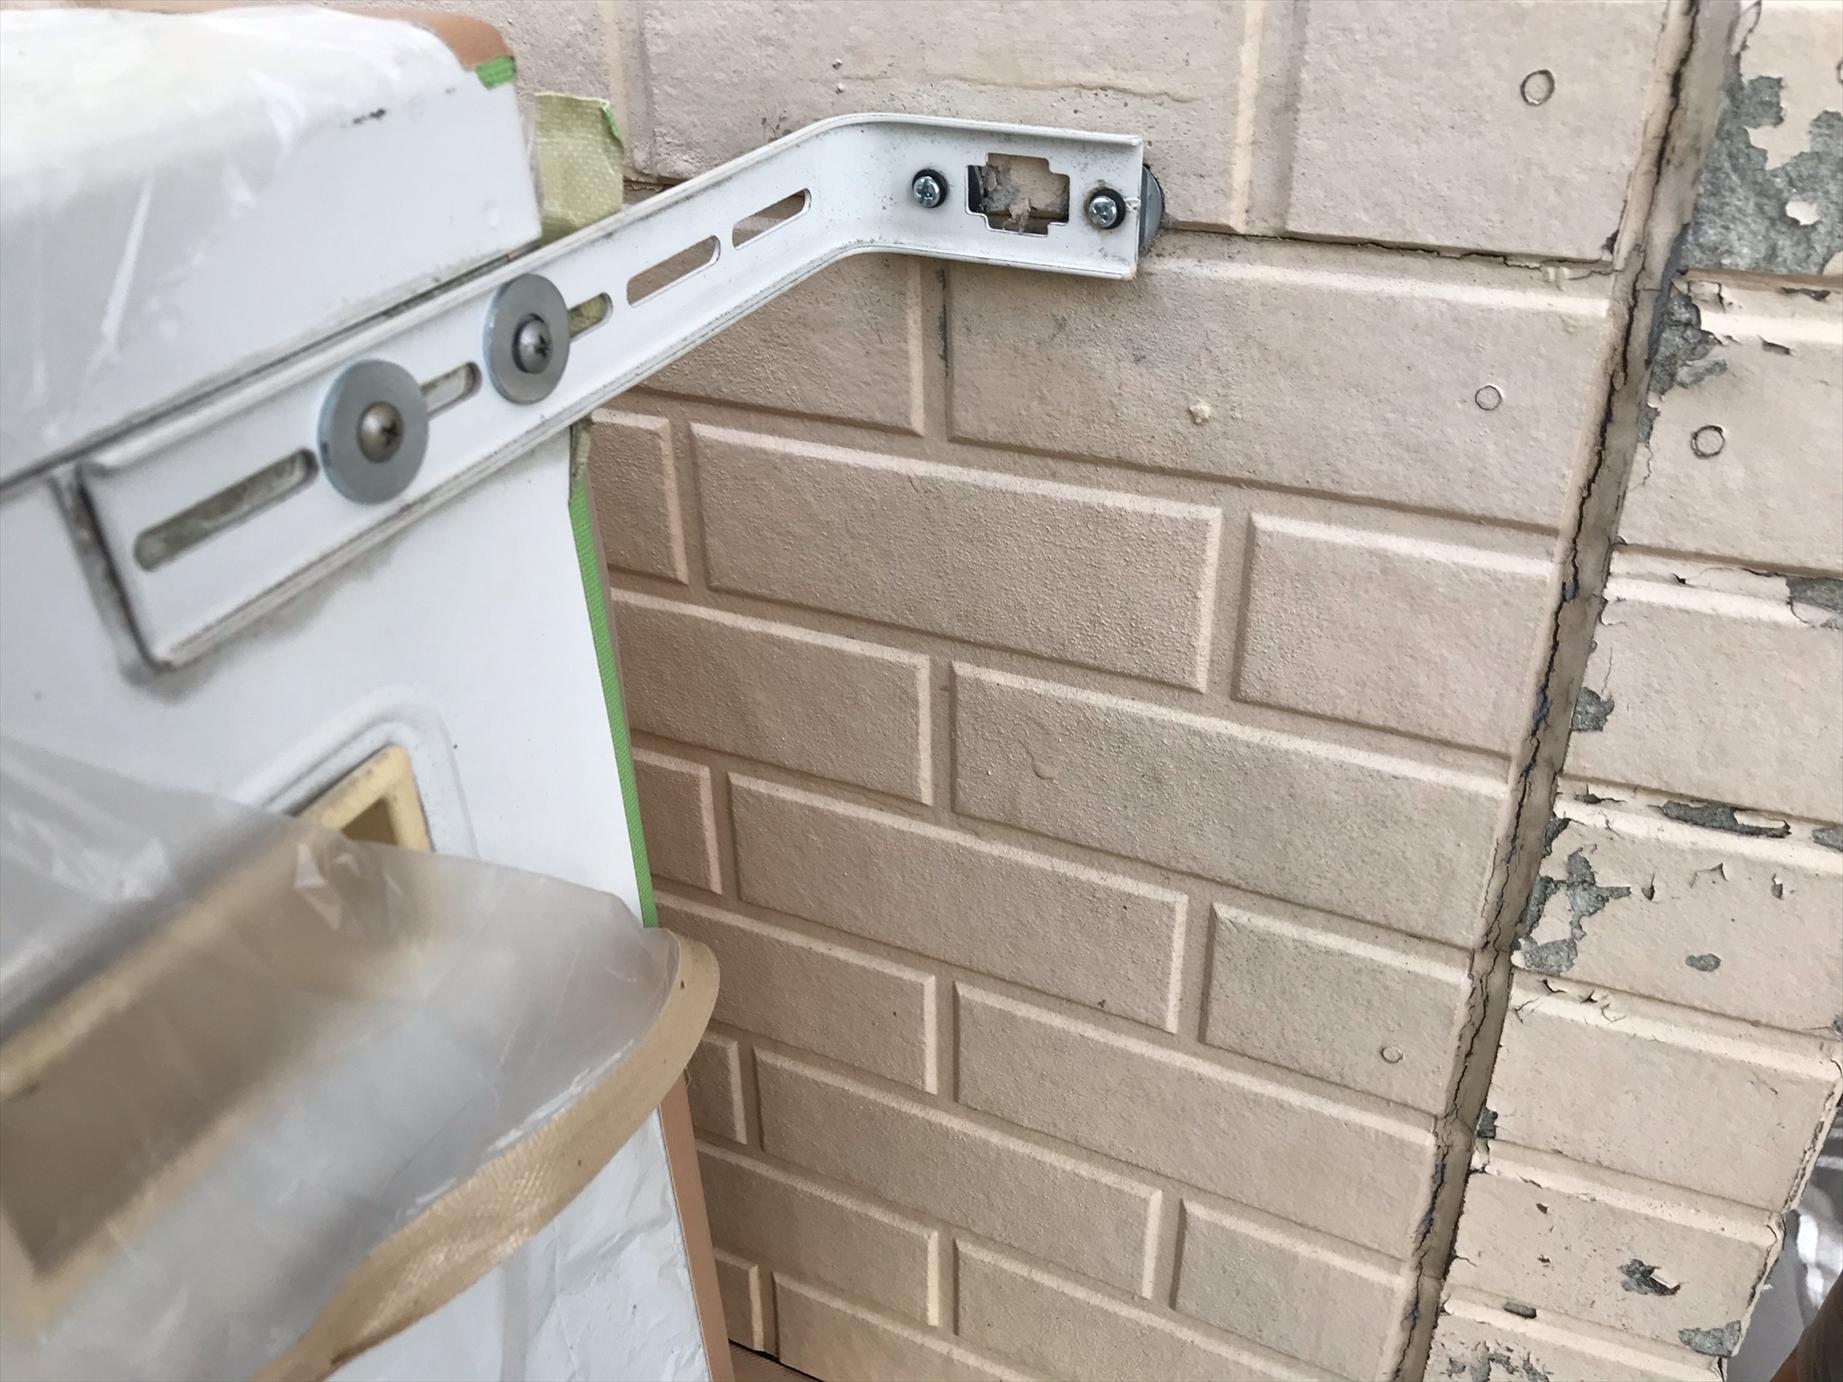 伊奈町賃貸一軒家塗装工事時にエアコン設置部品補修